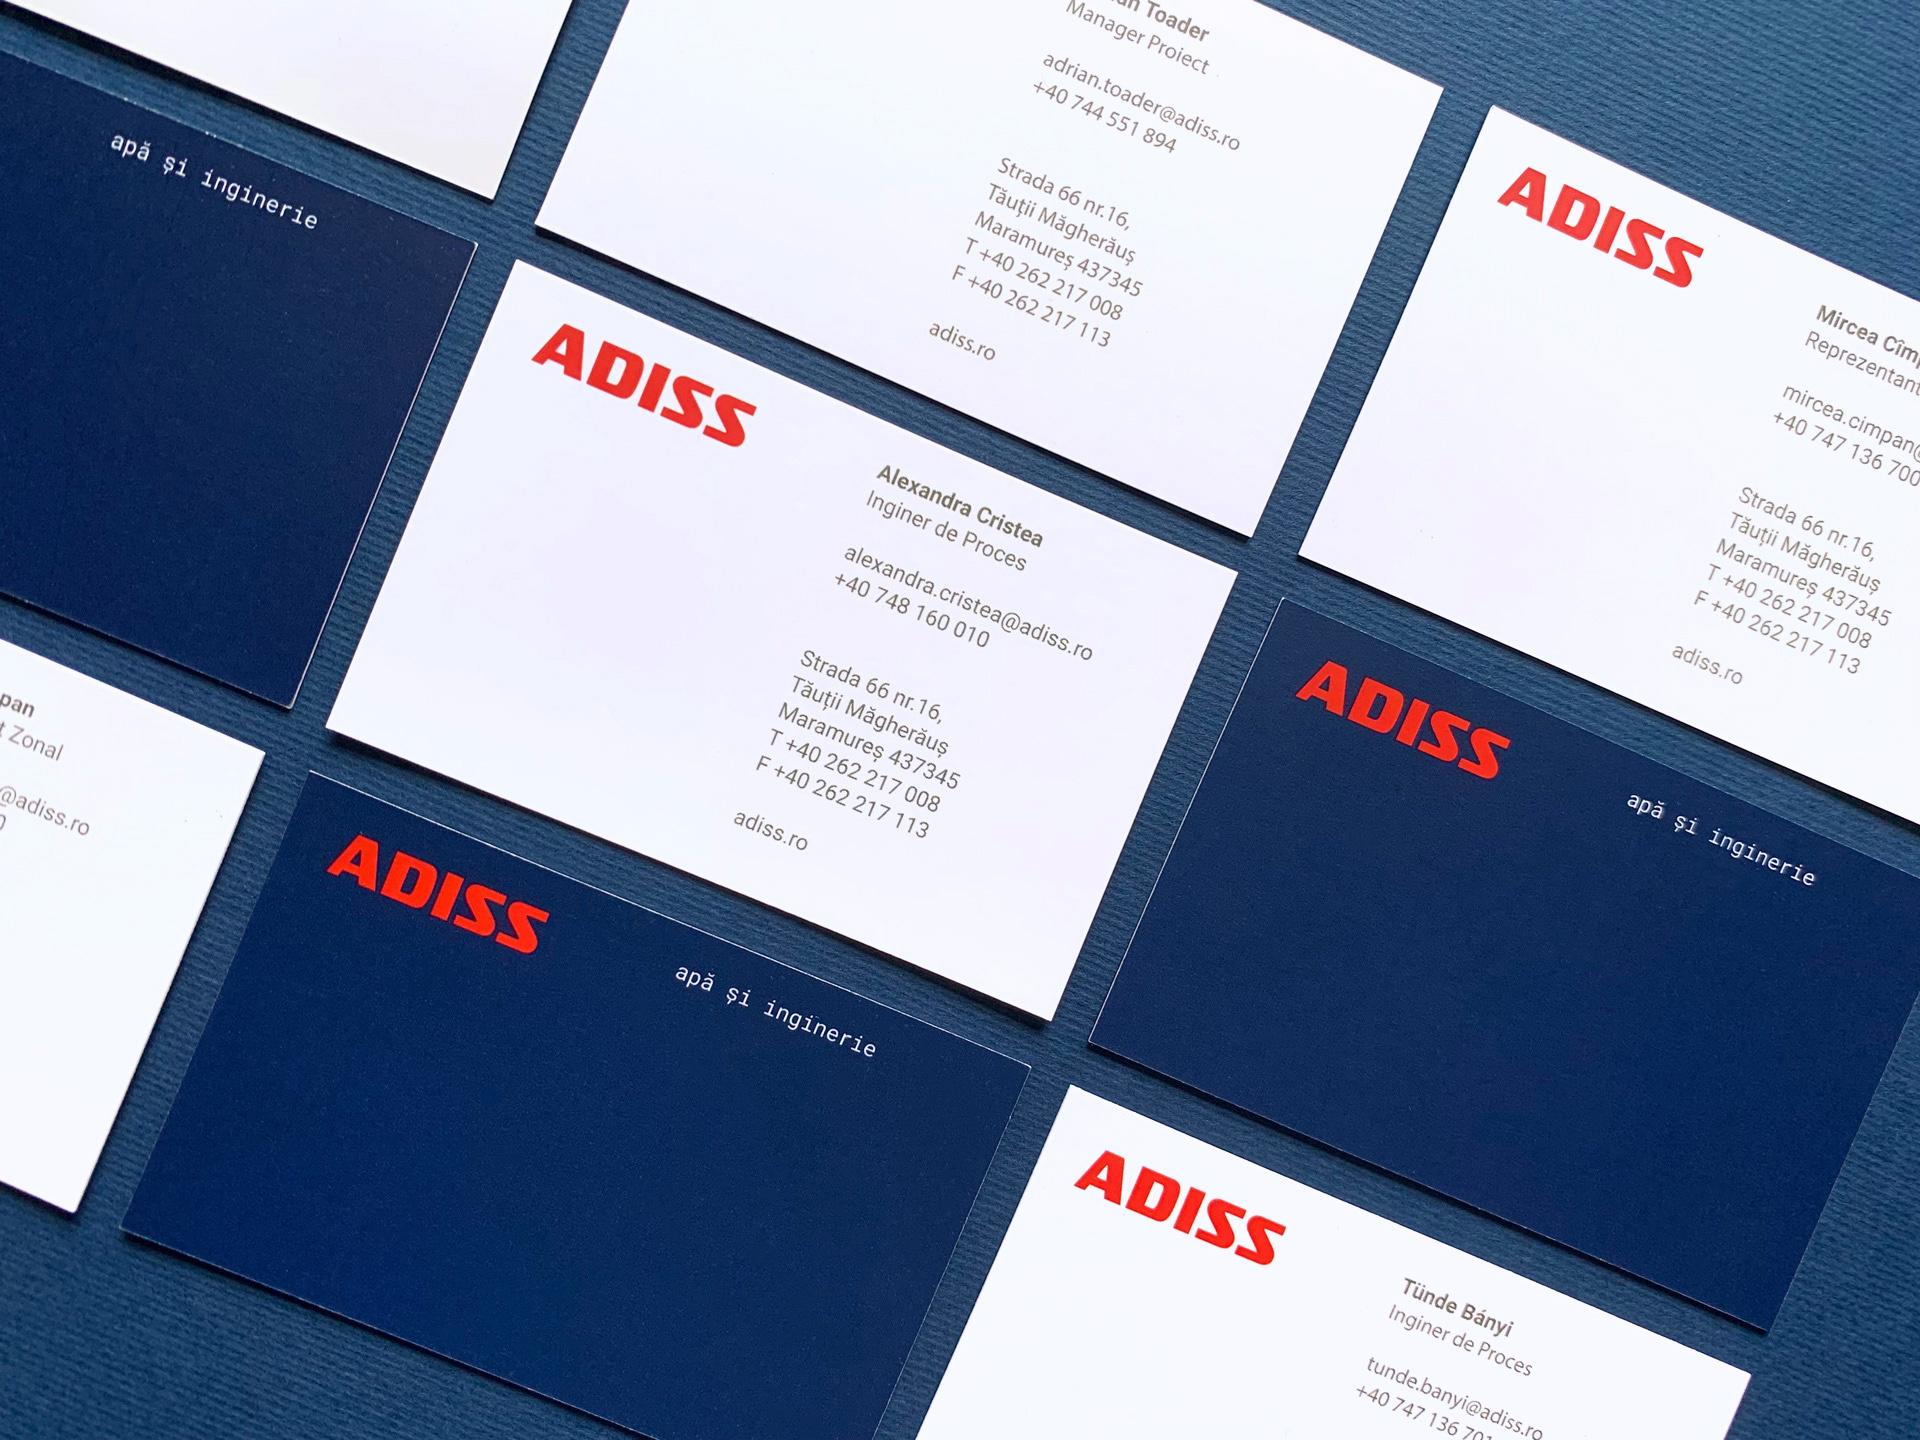 Adiss-business-cards.jpg